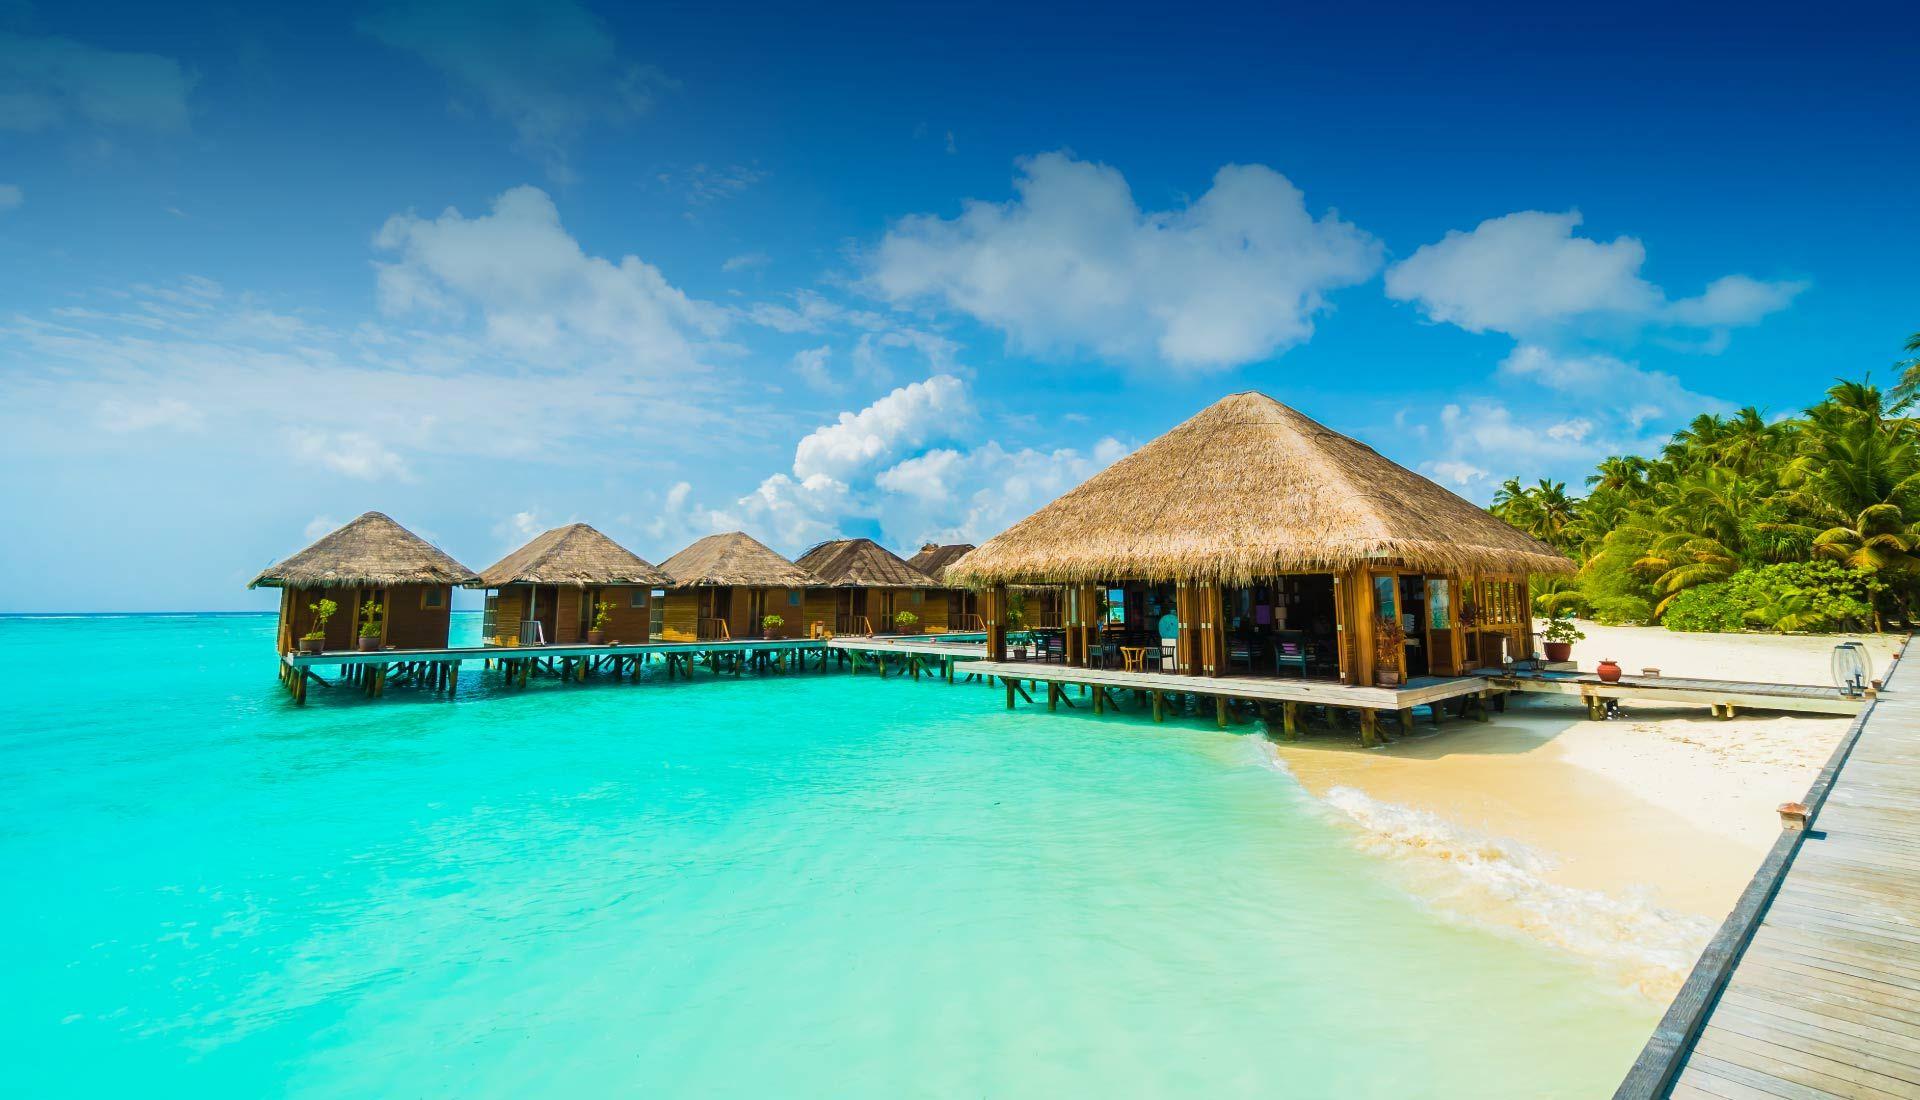 150 Packages جزر المالديف جزر المالديف آسيا Honeymoon Destinations On A Budget Maldives Honeymoon Package Maldives Tour Package